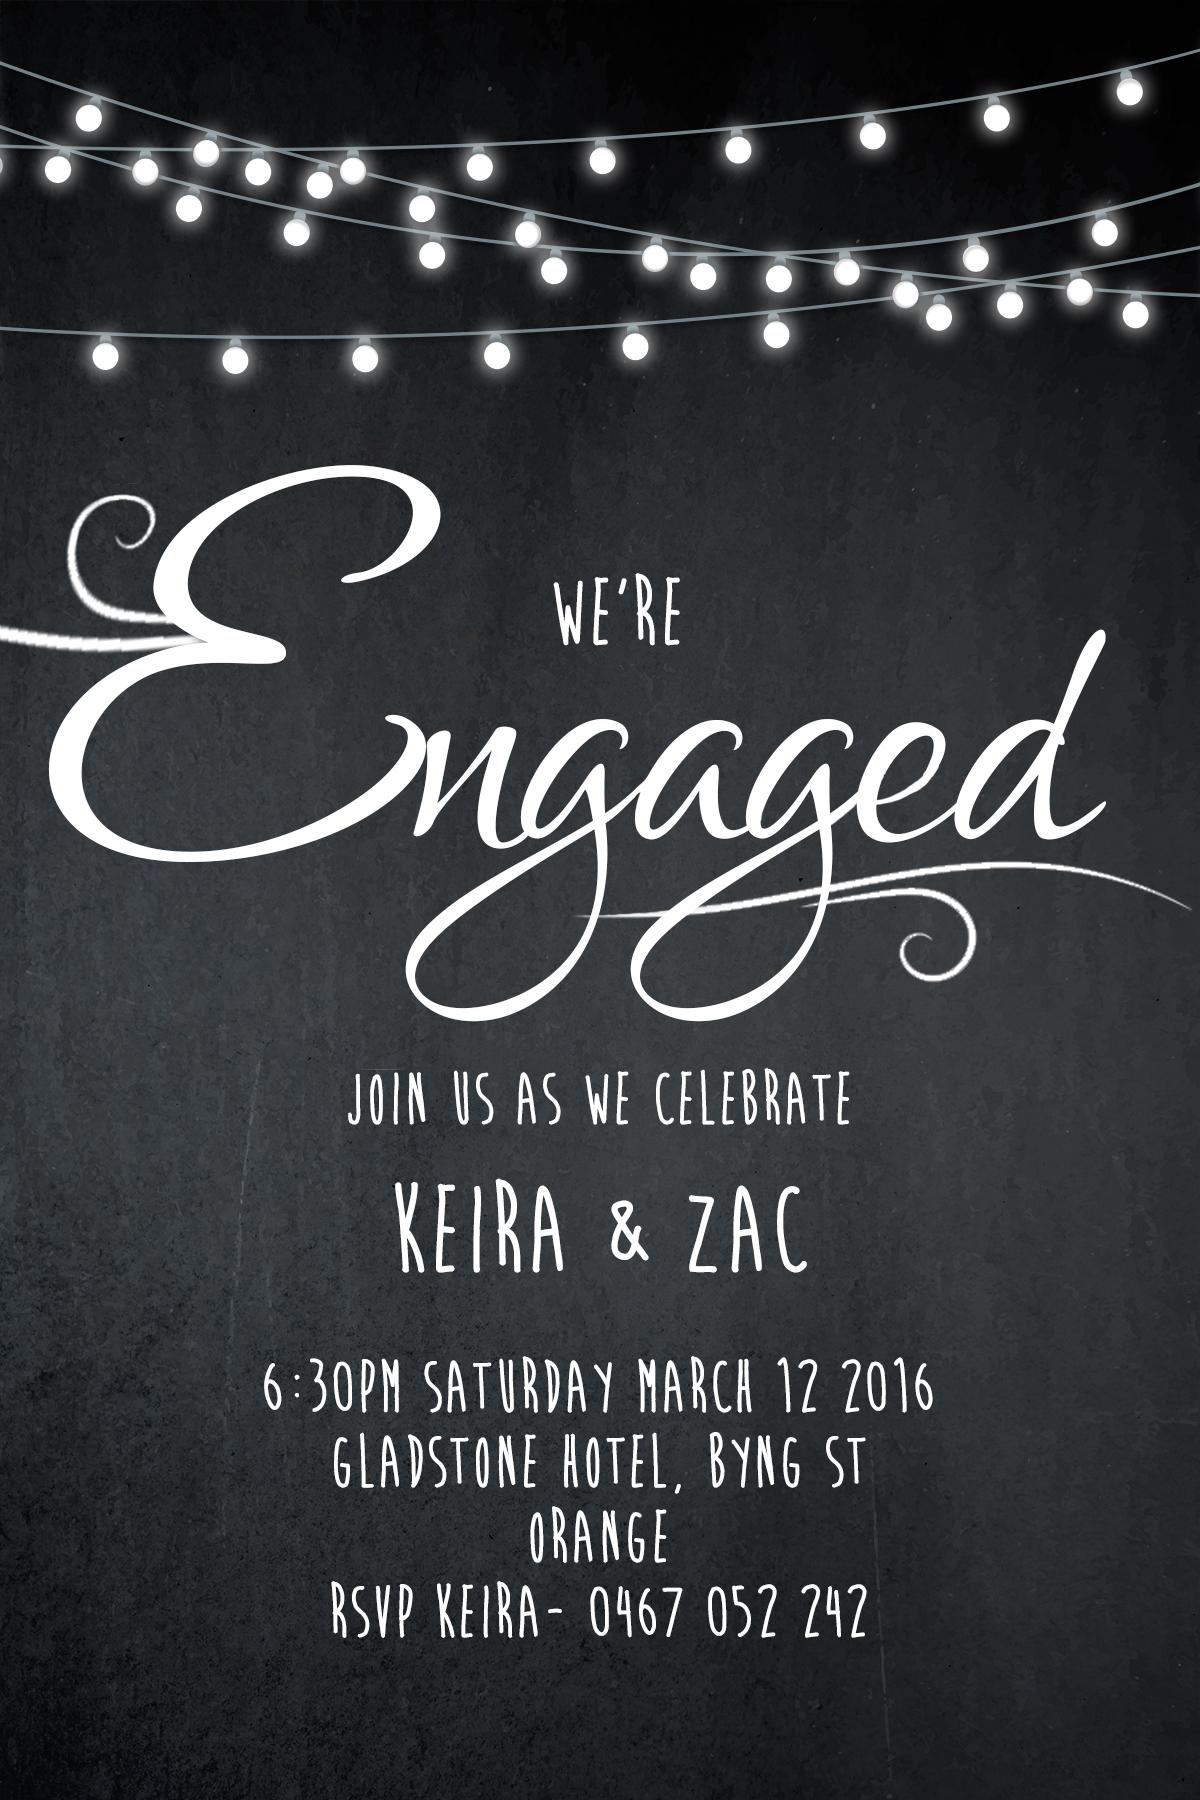 20150109-6x4-Engagement-Invite-FINAL.jpg